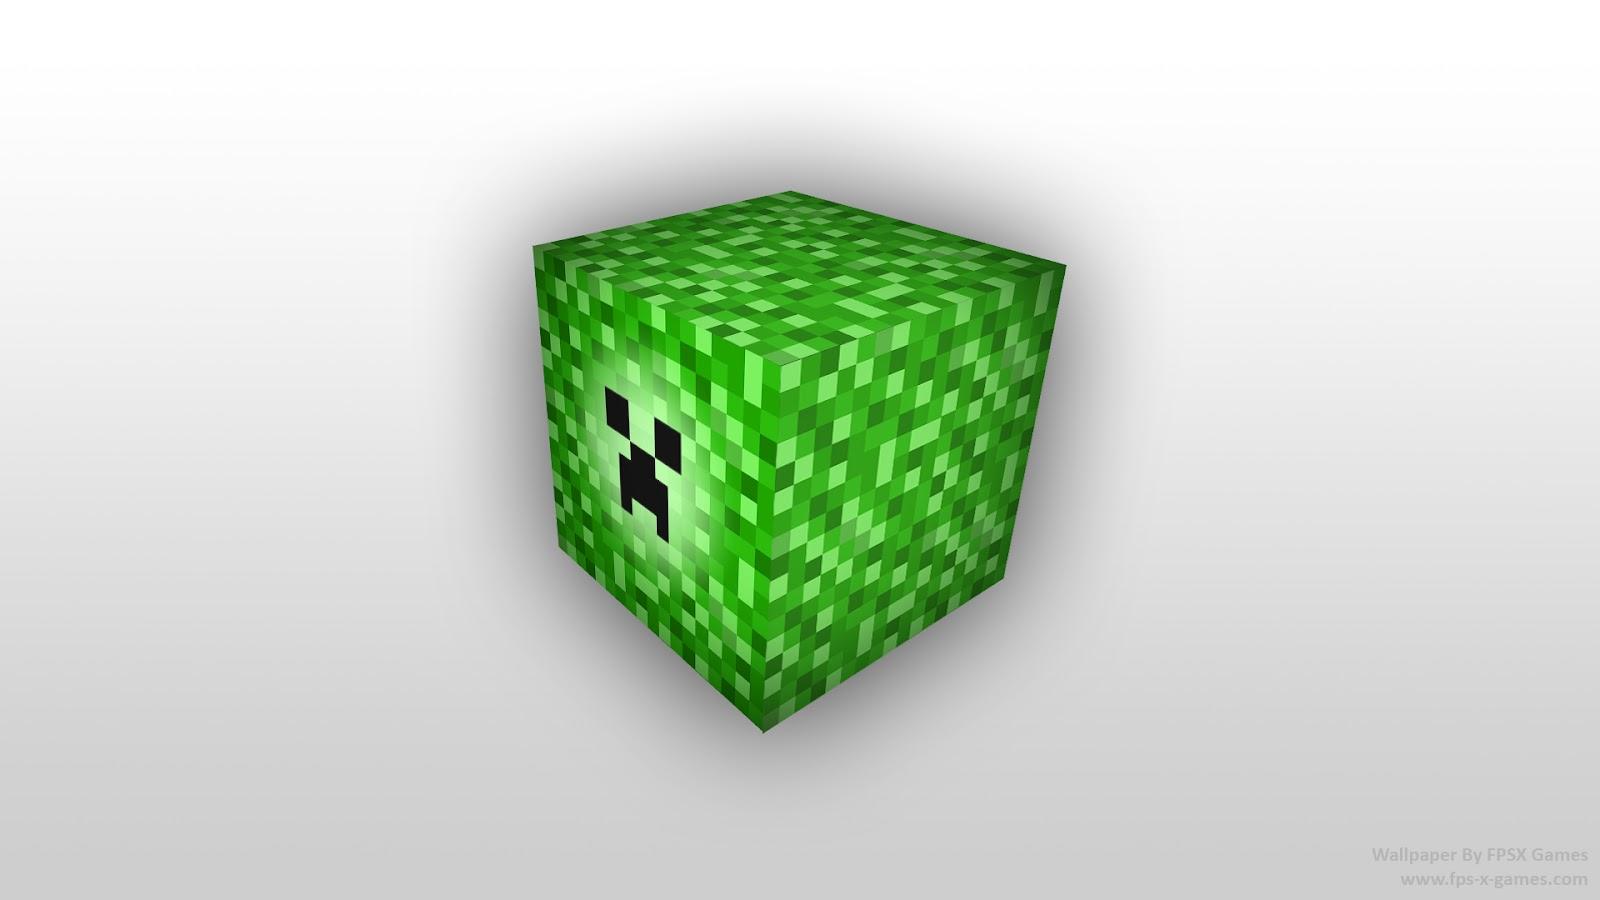 Minecraft creeper block wallpaper